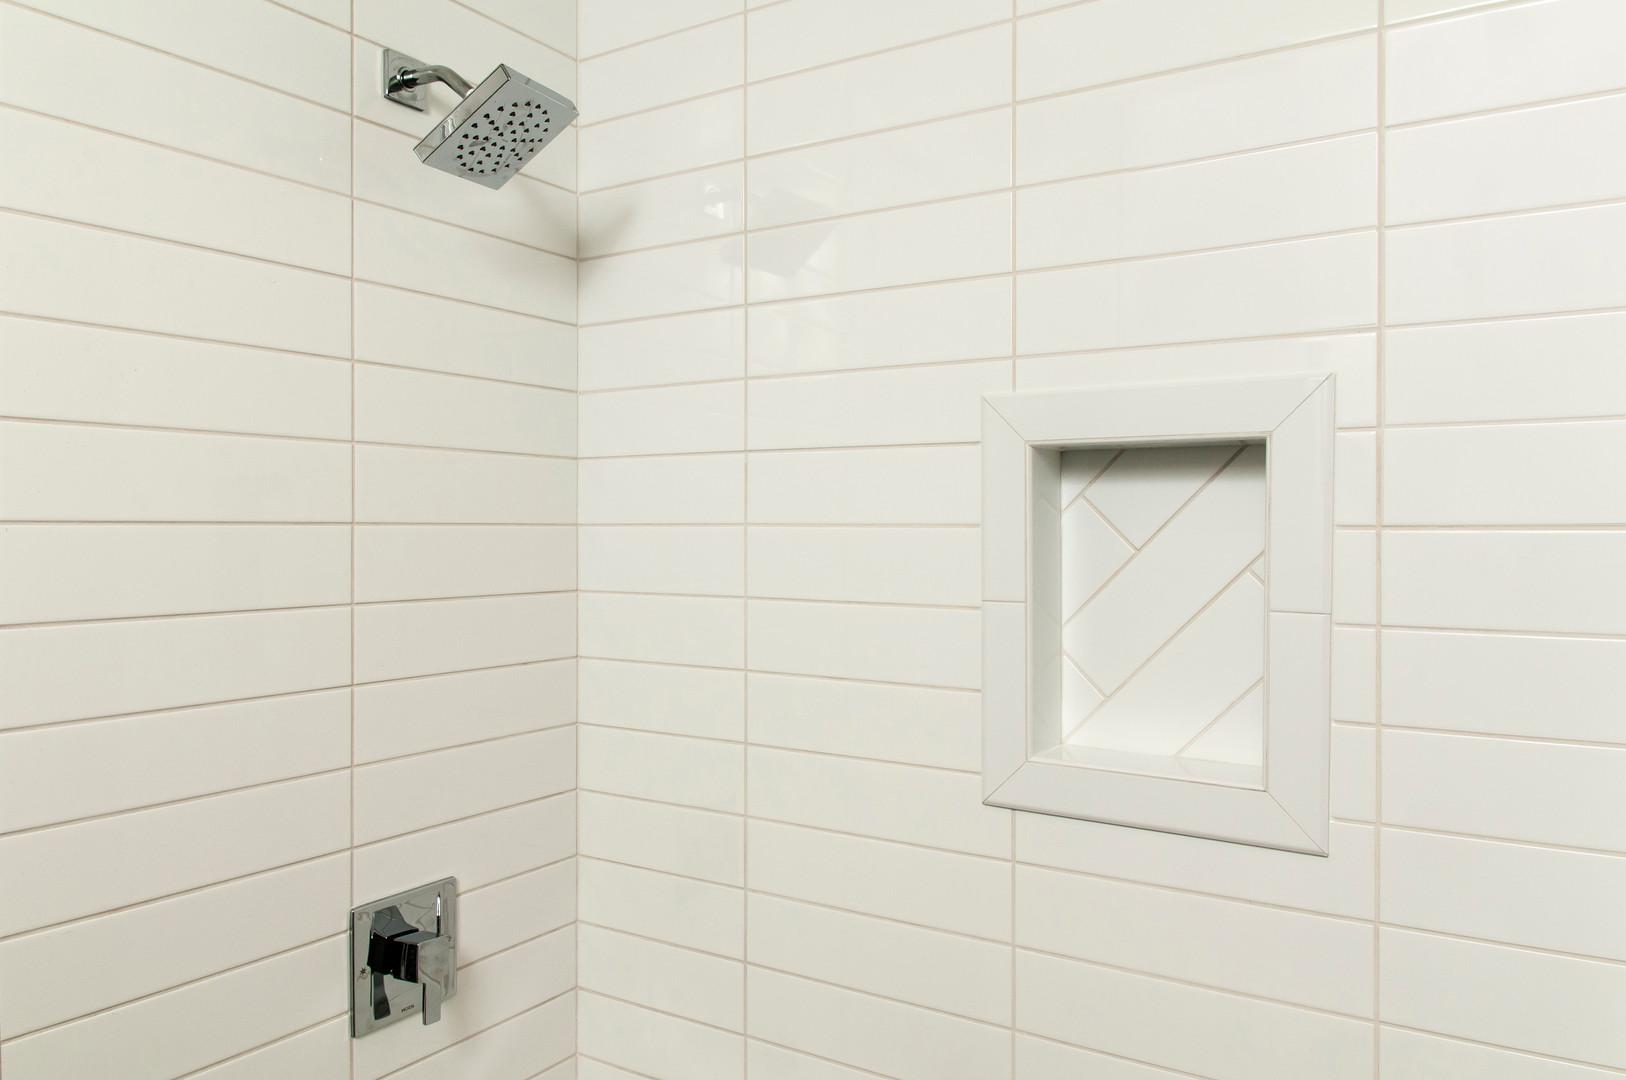 SouthPointe Construction . StudioWerks Custom    Field Tile: White 4 x 16        Tile Pattern: Straight Stack Horizontal        Niche: Ceramic White 